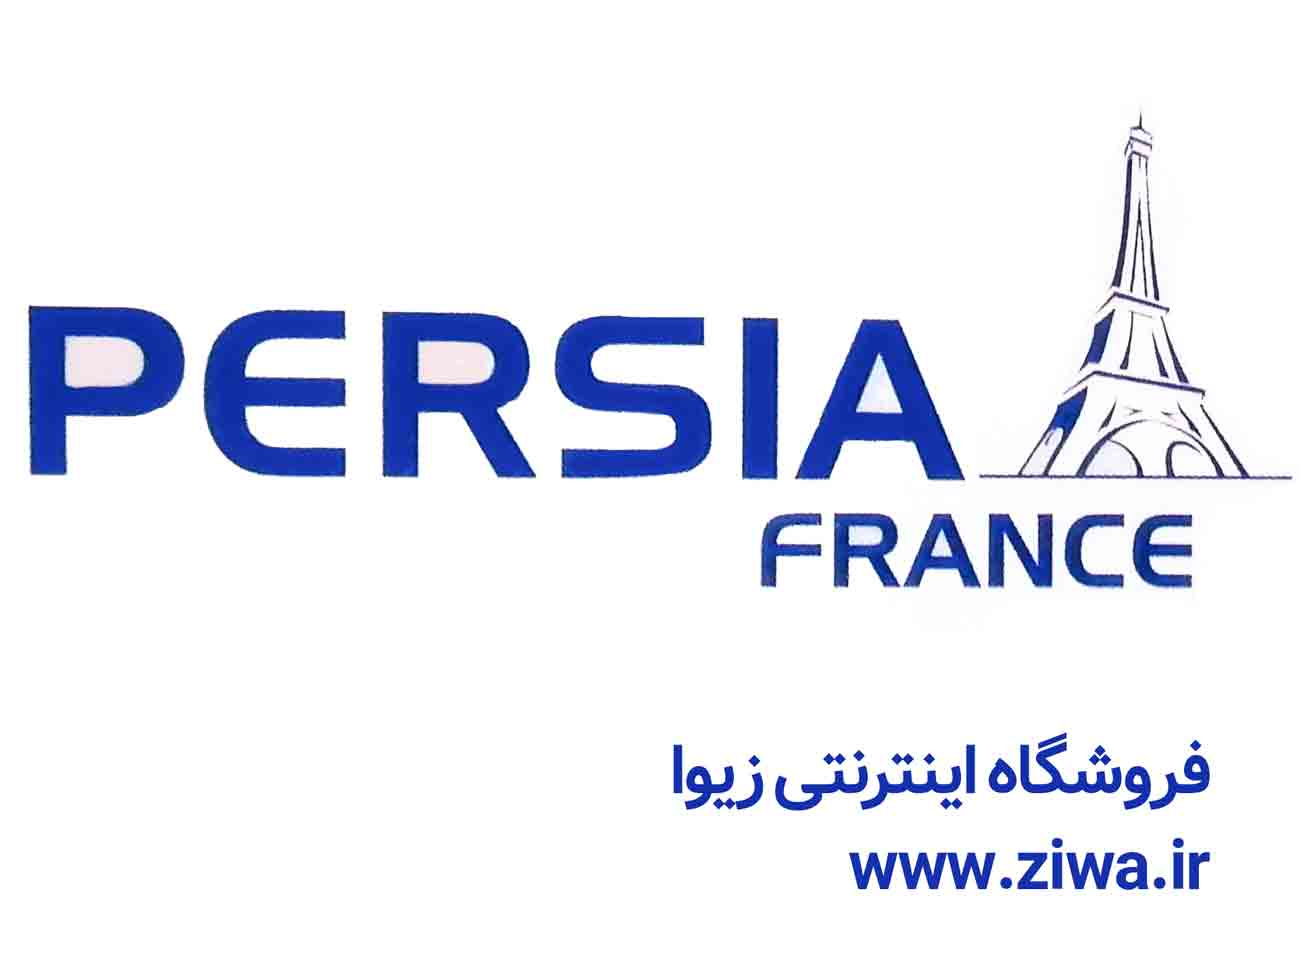 لوگو برند پرشیا فرانس logo brand persia france